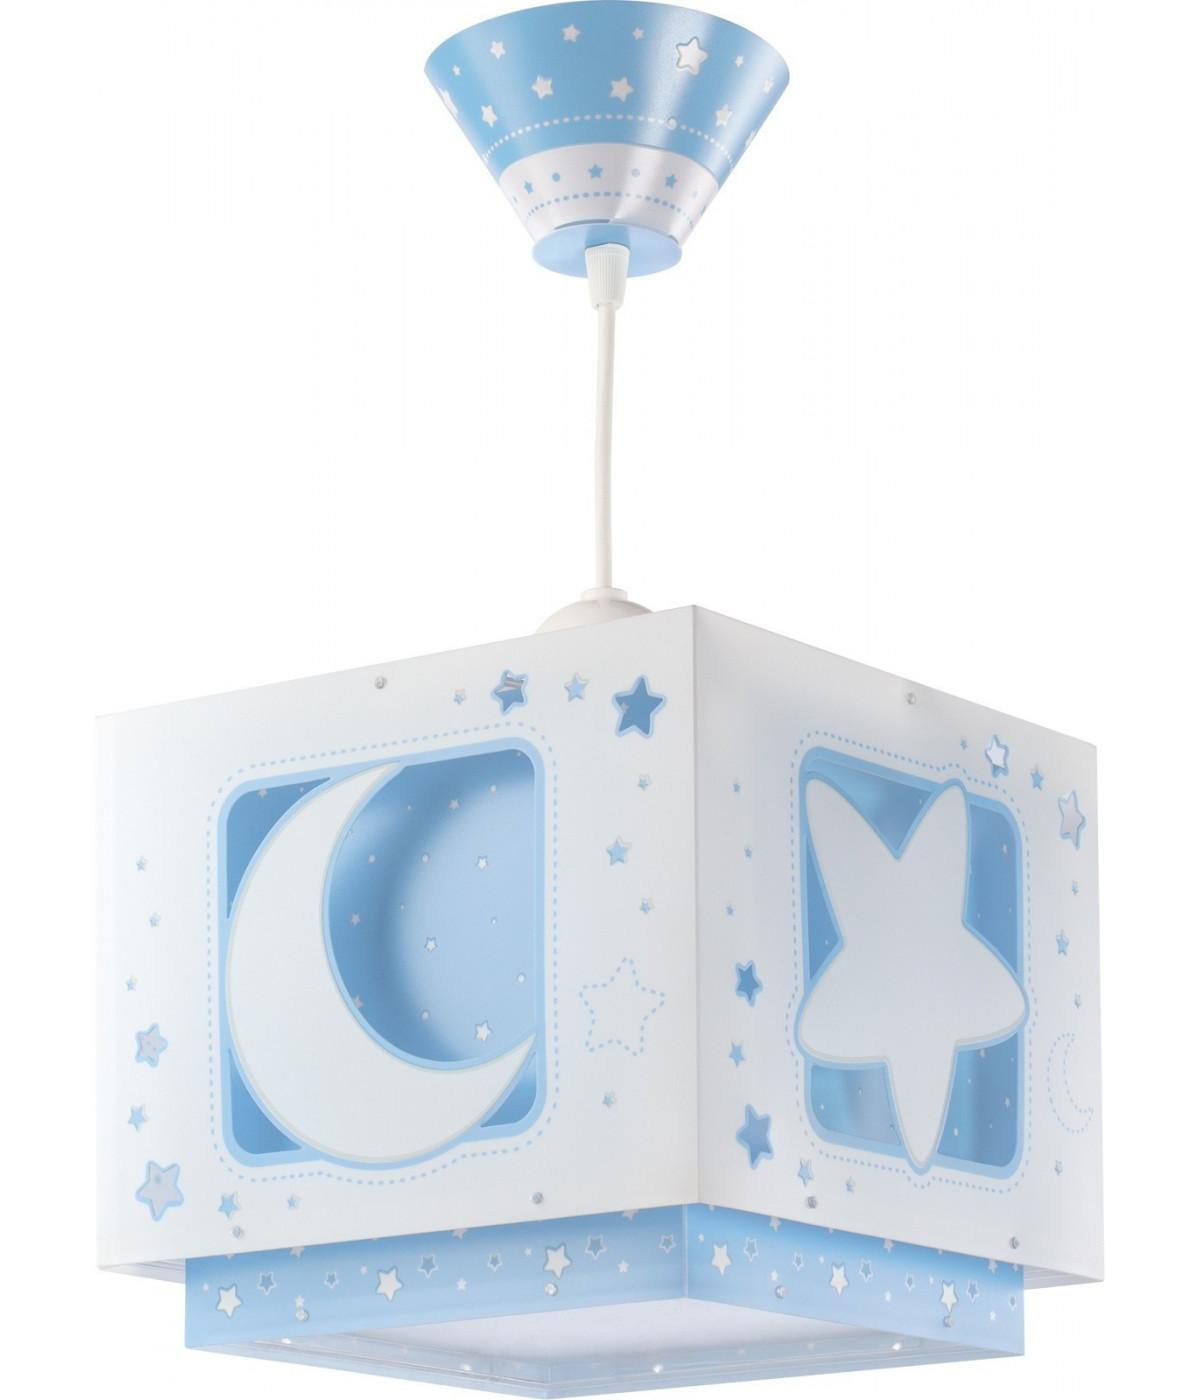 Lampada a sospensione per bambini Moonlight blu